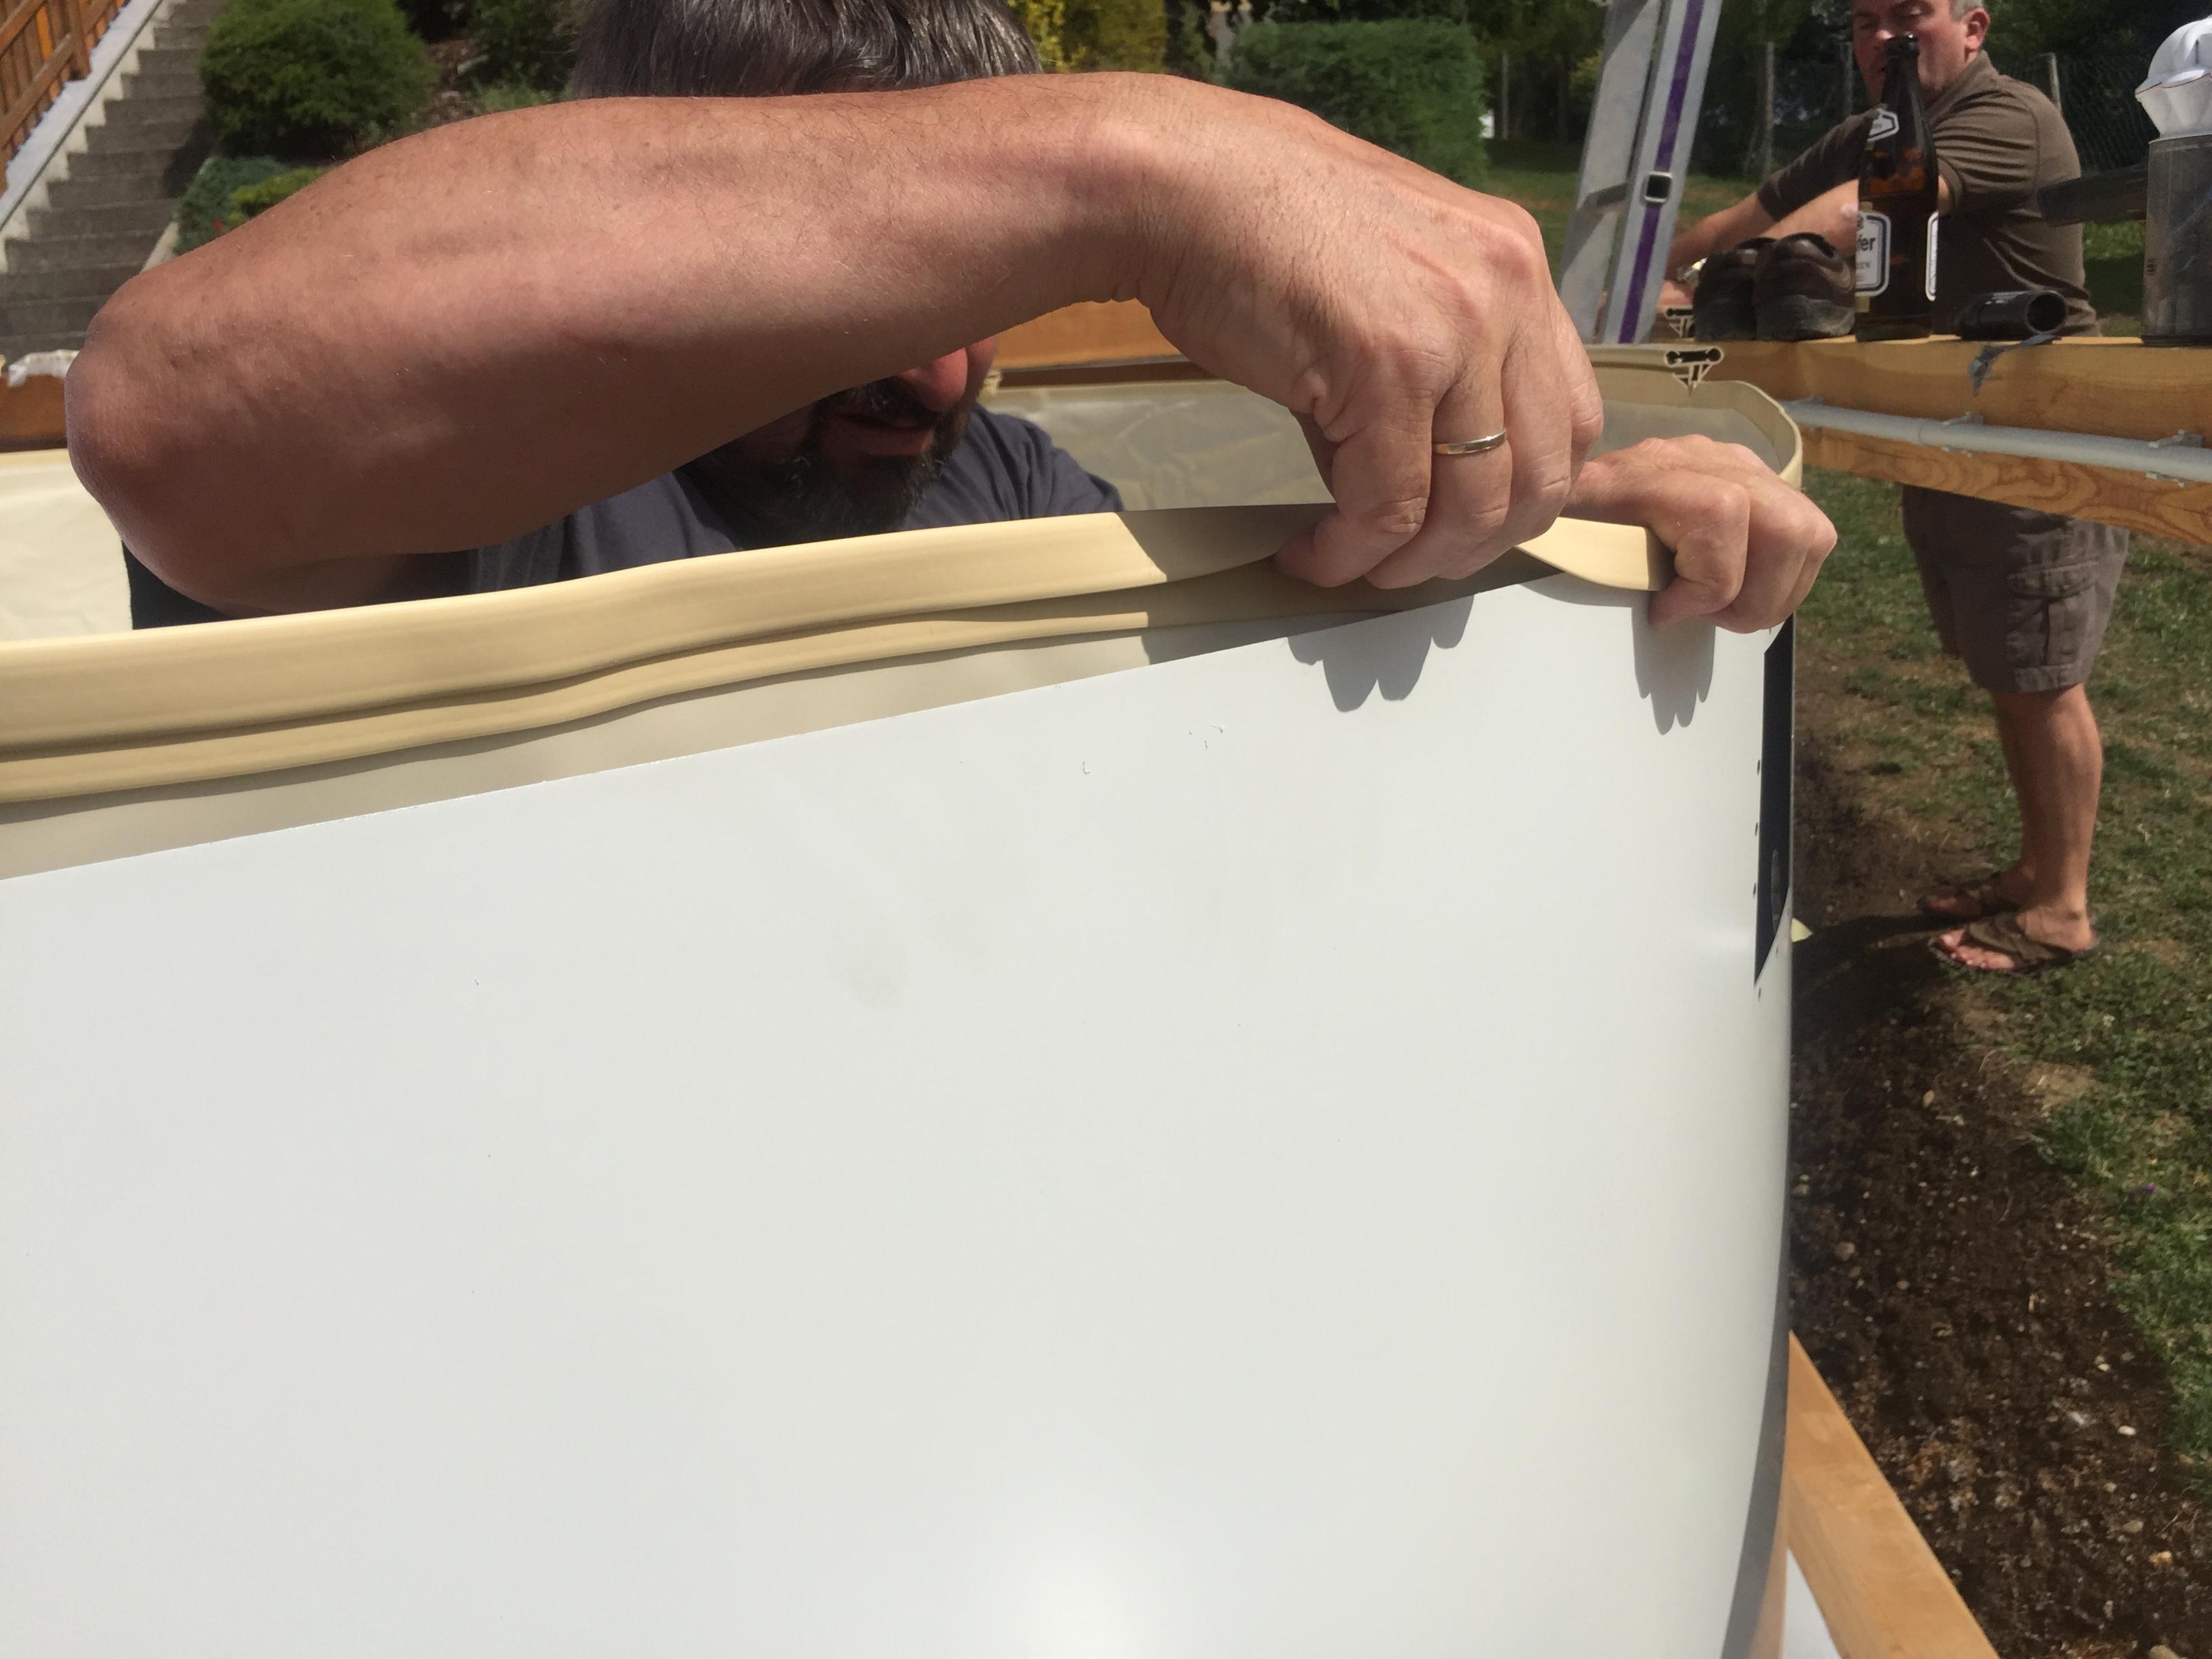 Rundpool prime 400 x 135 cm komplettset apoolco for Poolfolie montieren